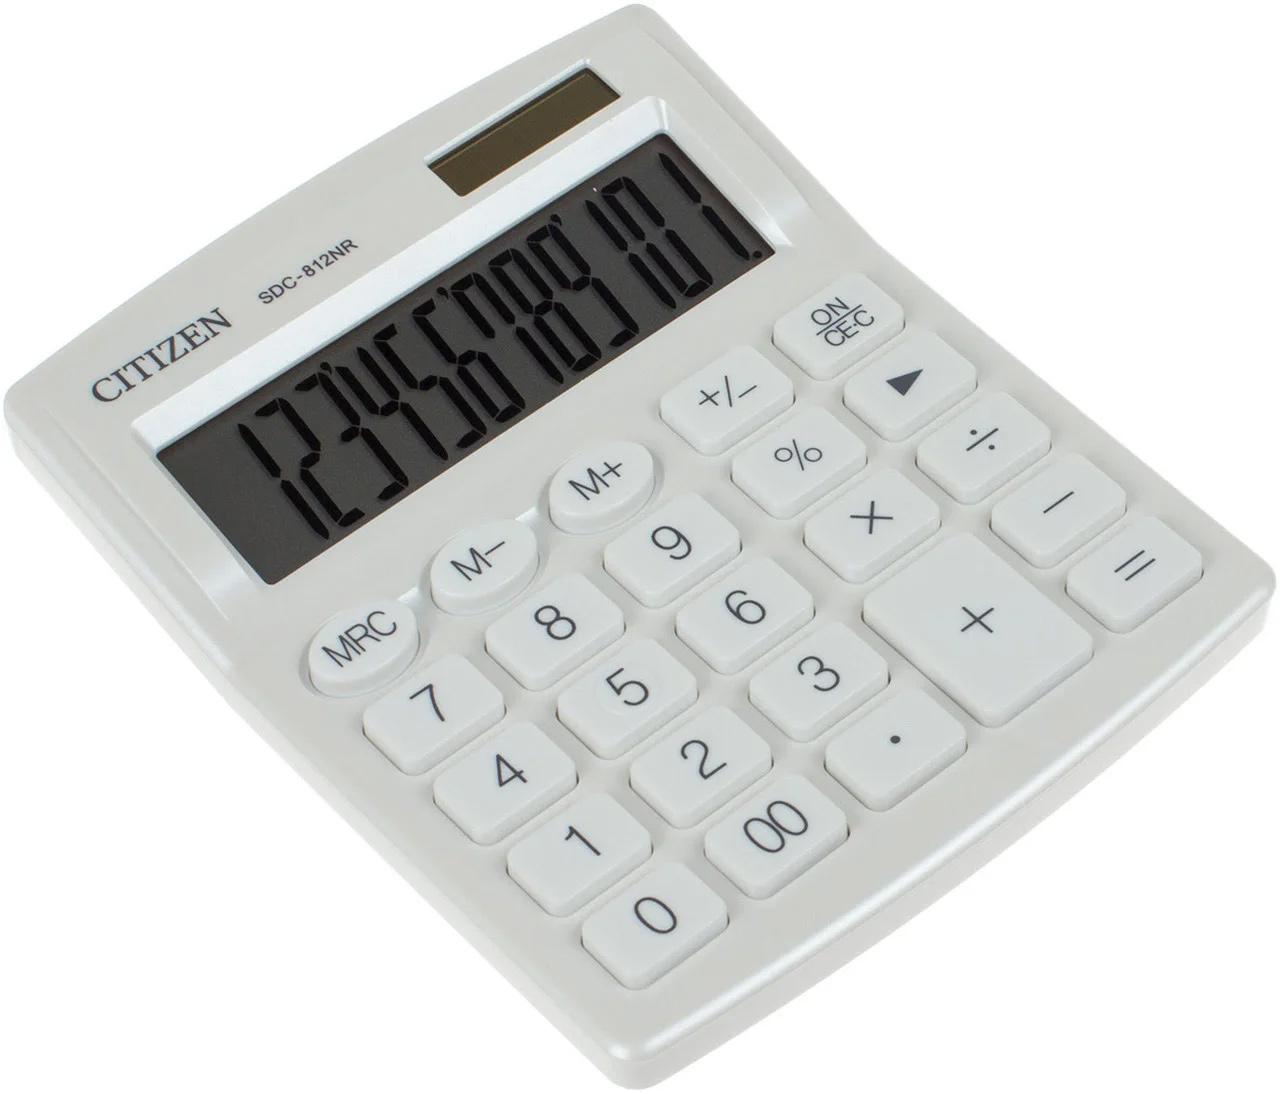 Калькулятор бухгалтерский SDC812NRWHE-white 12 разрядов, 125х100х34мм., бел. Citizen - фото 3